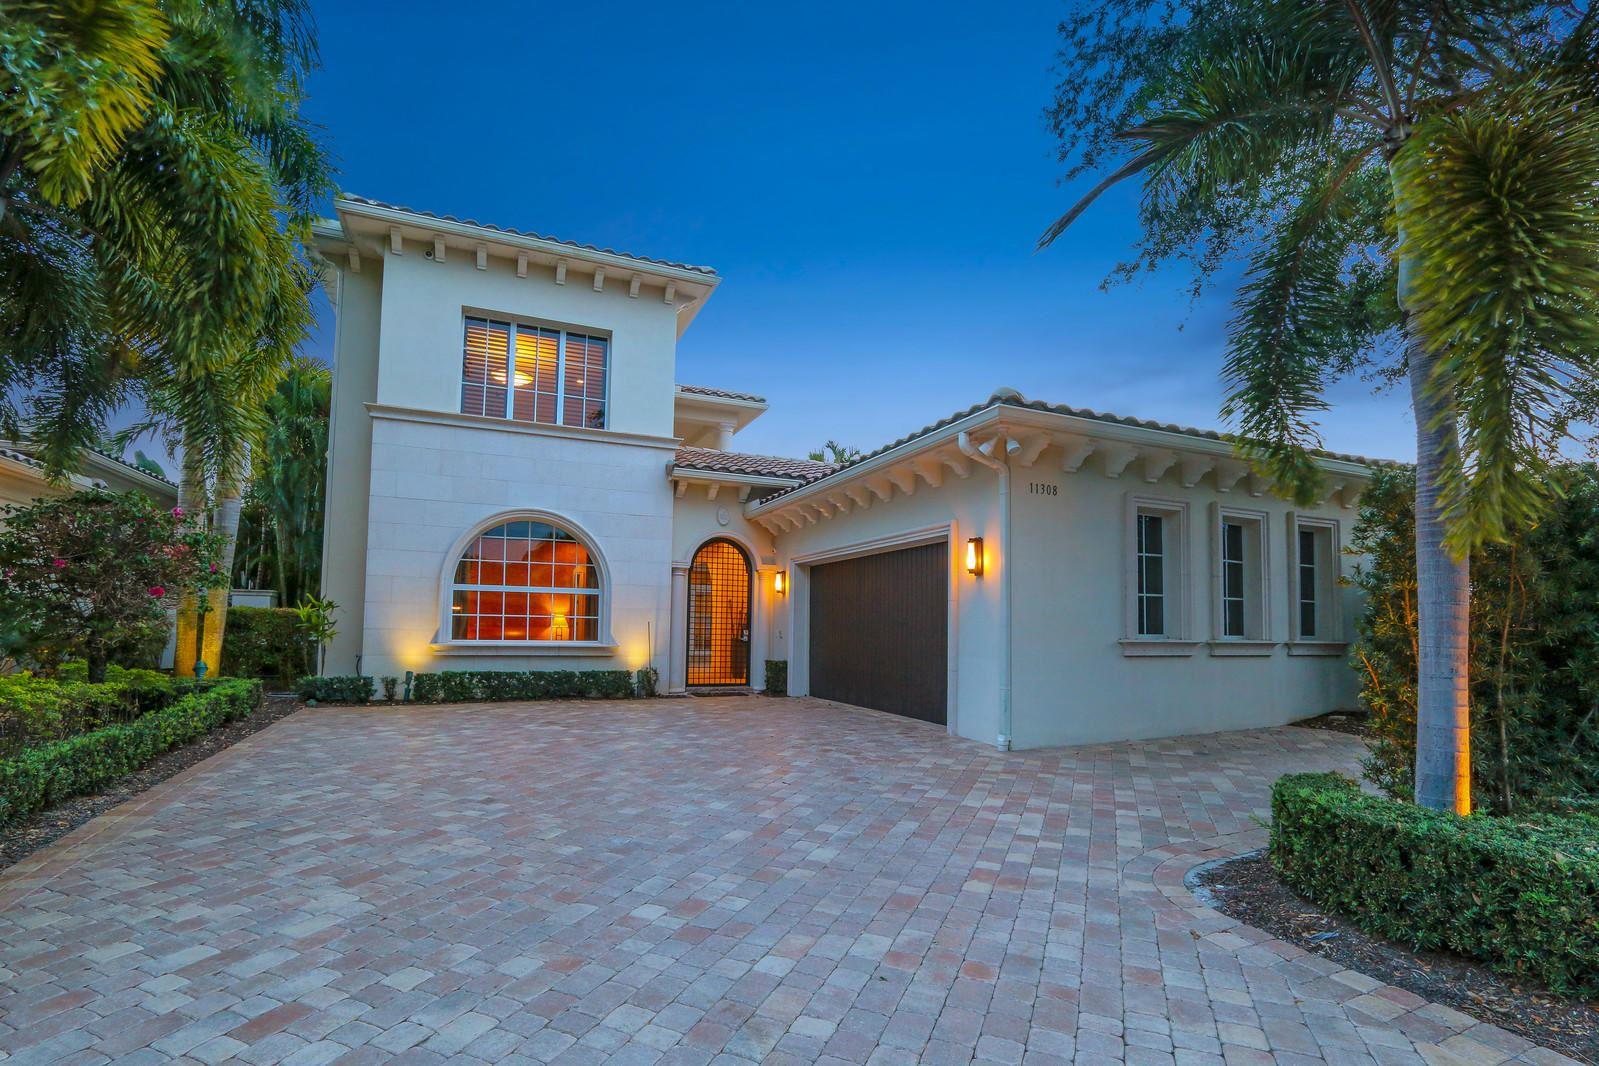 Photo of 11308 Caladium Lane, Palm Beach Gardens, FL 33418 (MLS # RX-10608089)